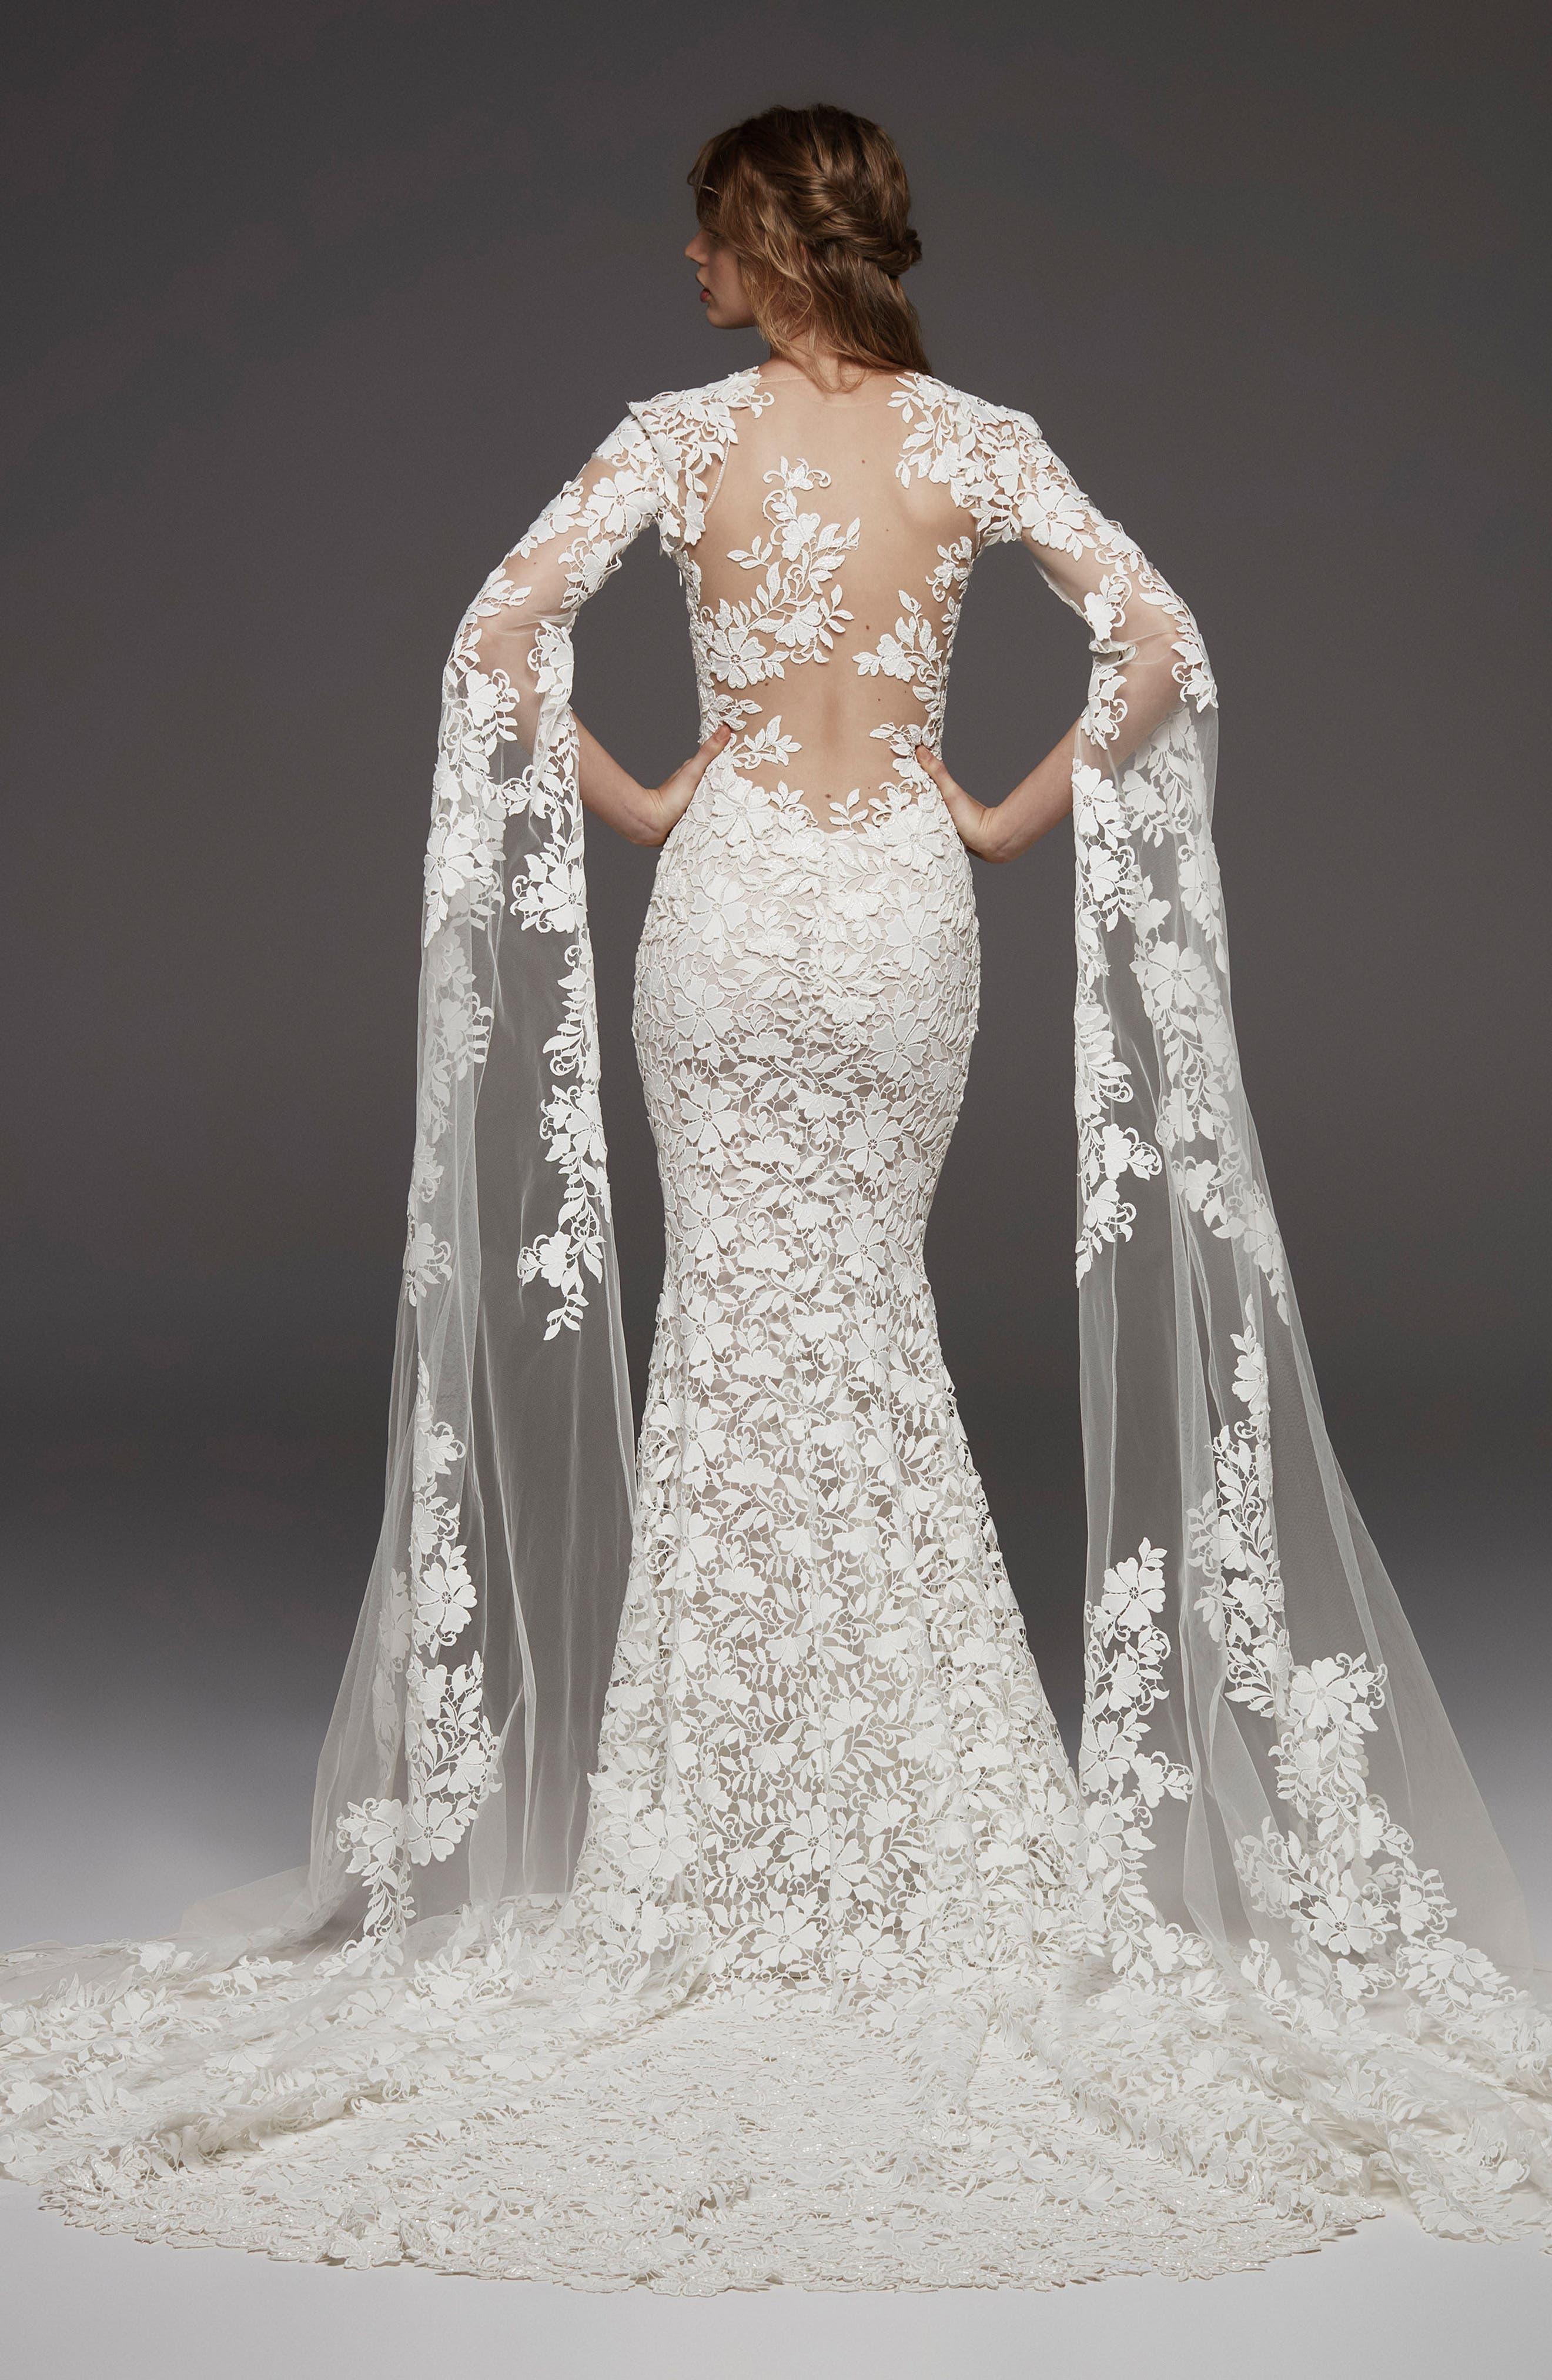 Altelier Pronovias Himalaya Sleeveless Lace Gown,                             Alternate thumbnail 2, color,                             OFF WHITE